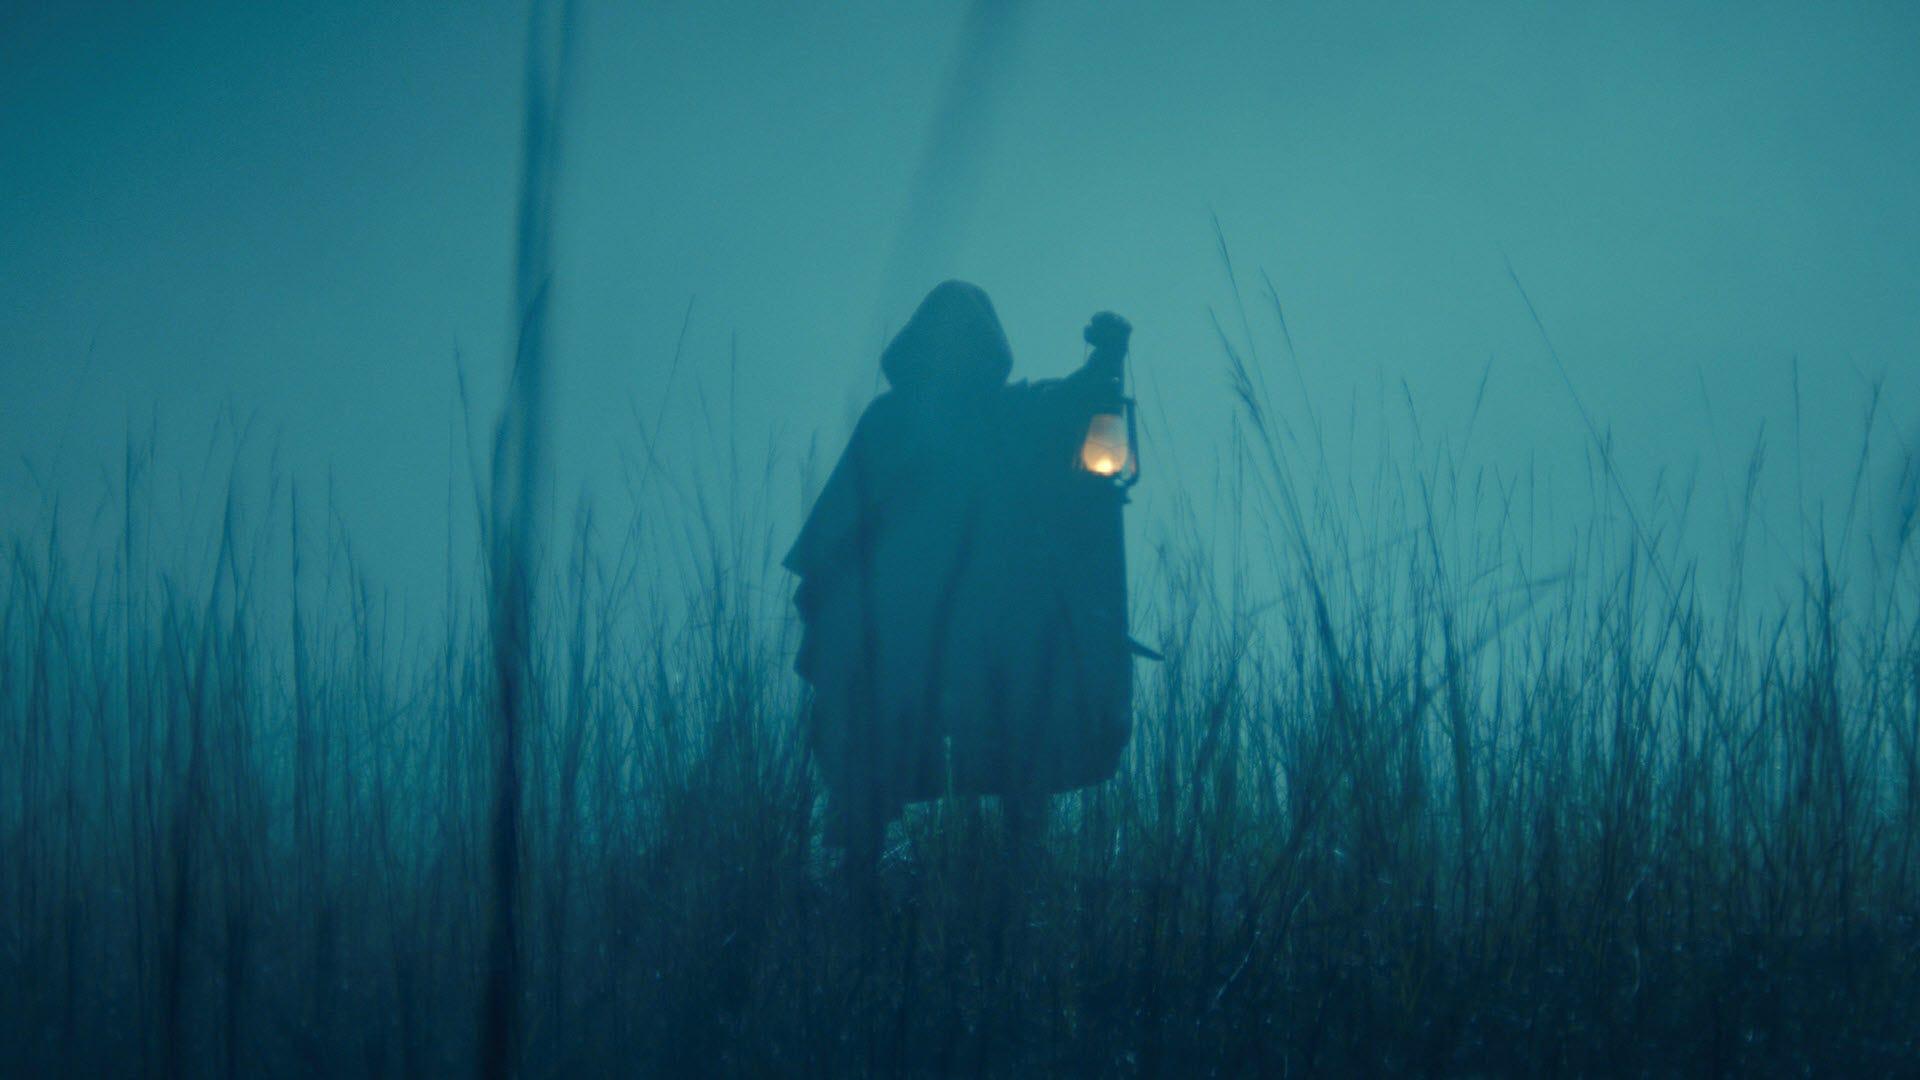 A figure hidden in shadow holding a lantern.